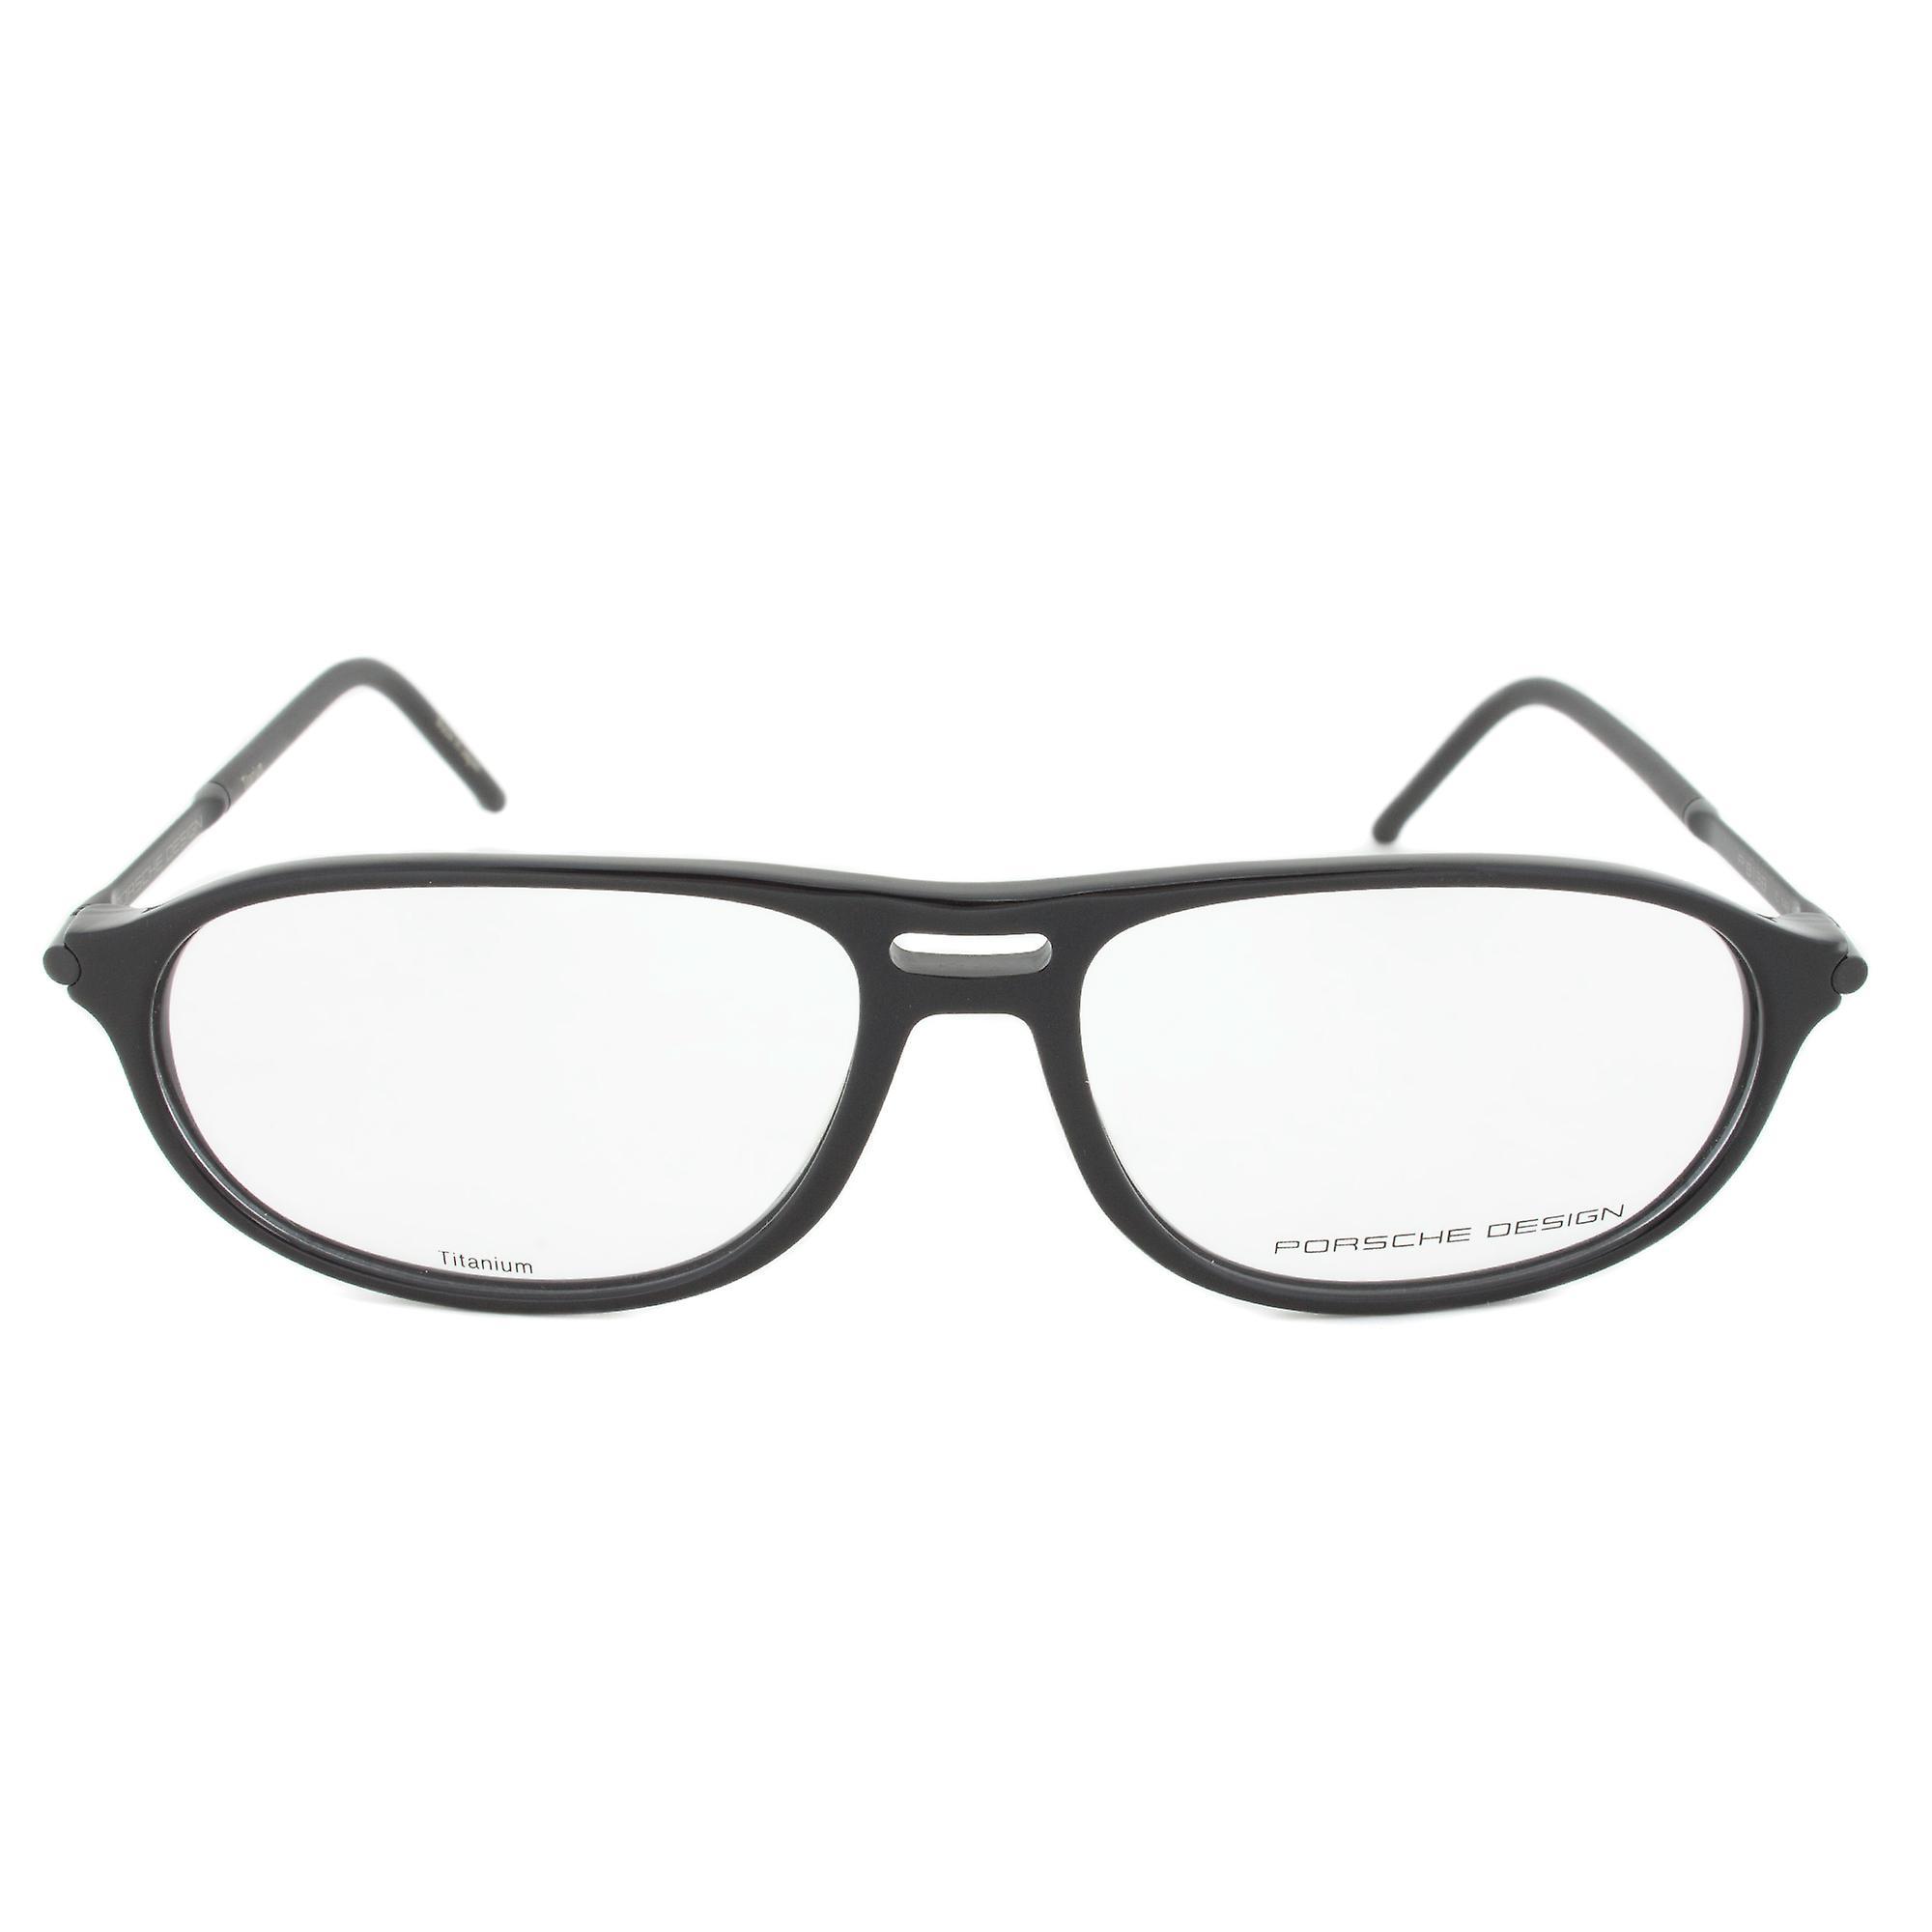 Porsche Design P8138 C Oval   Black  Eyeglass Frames